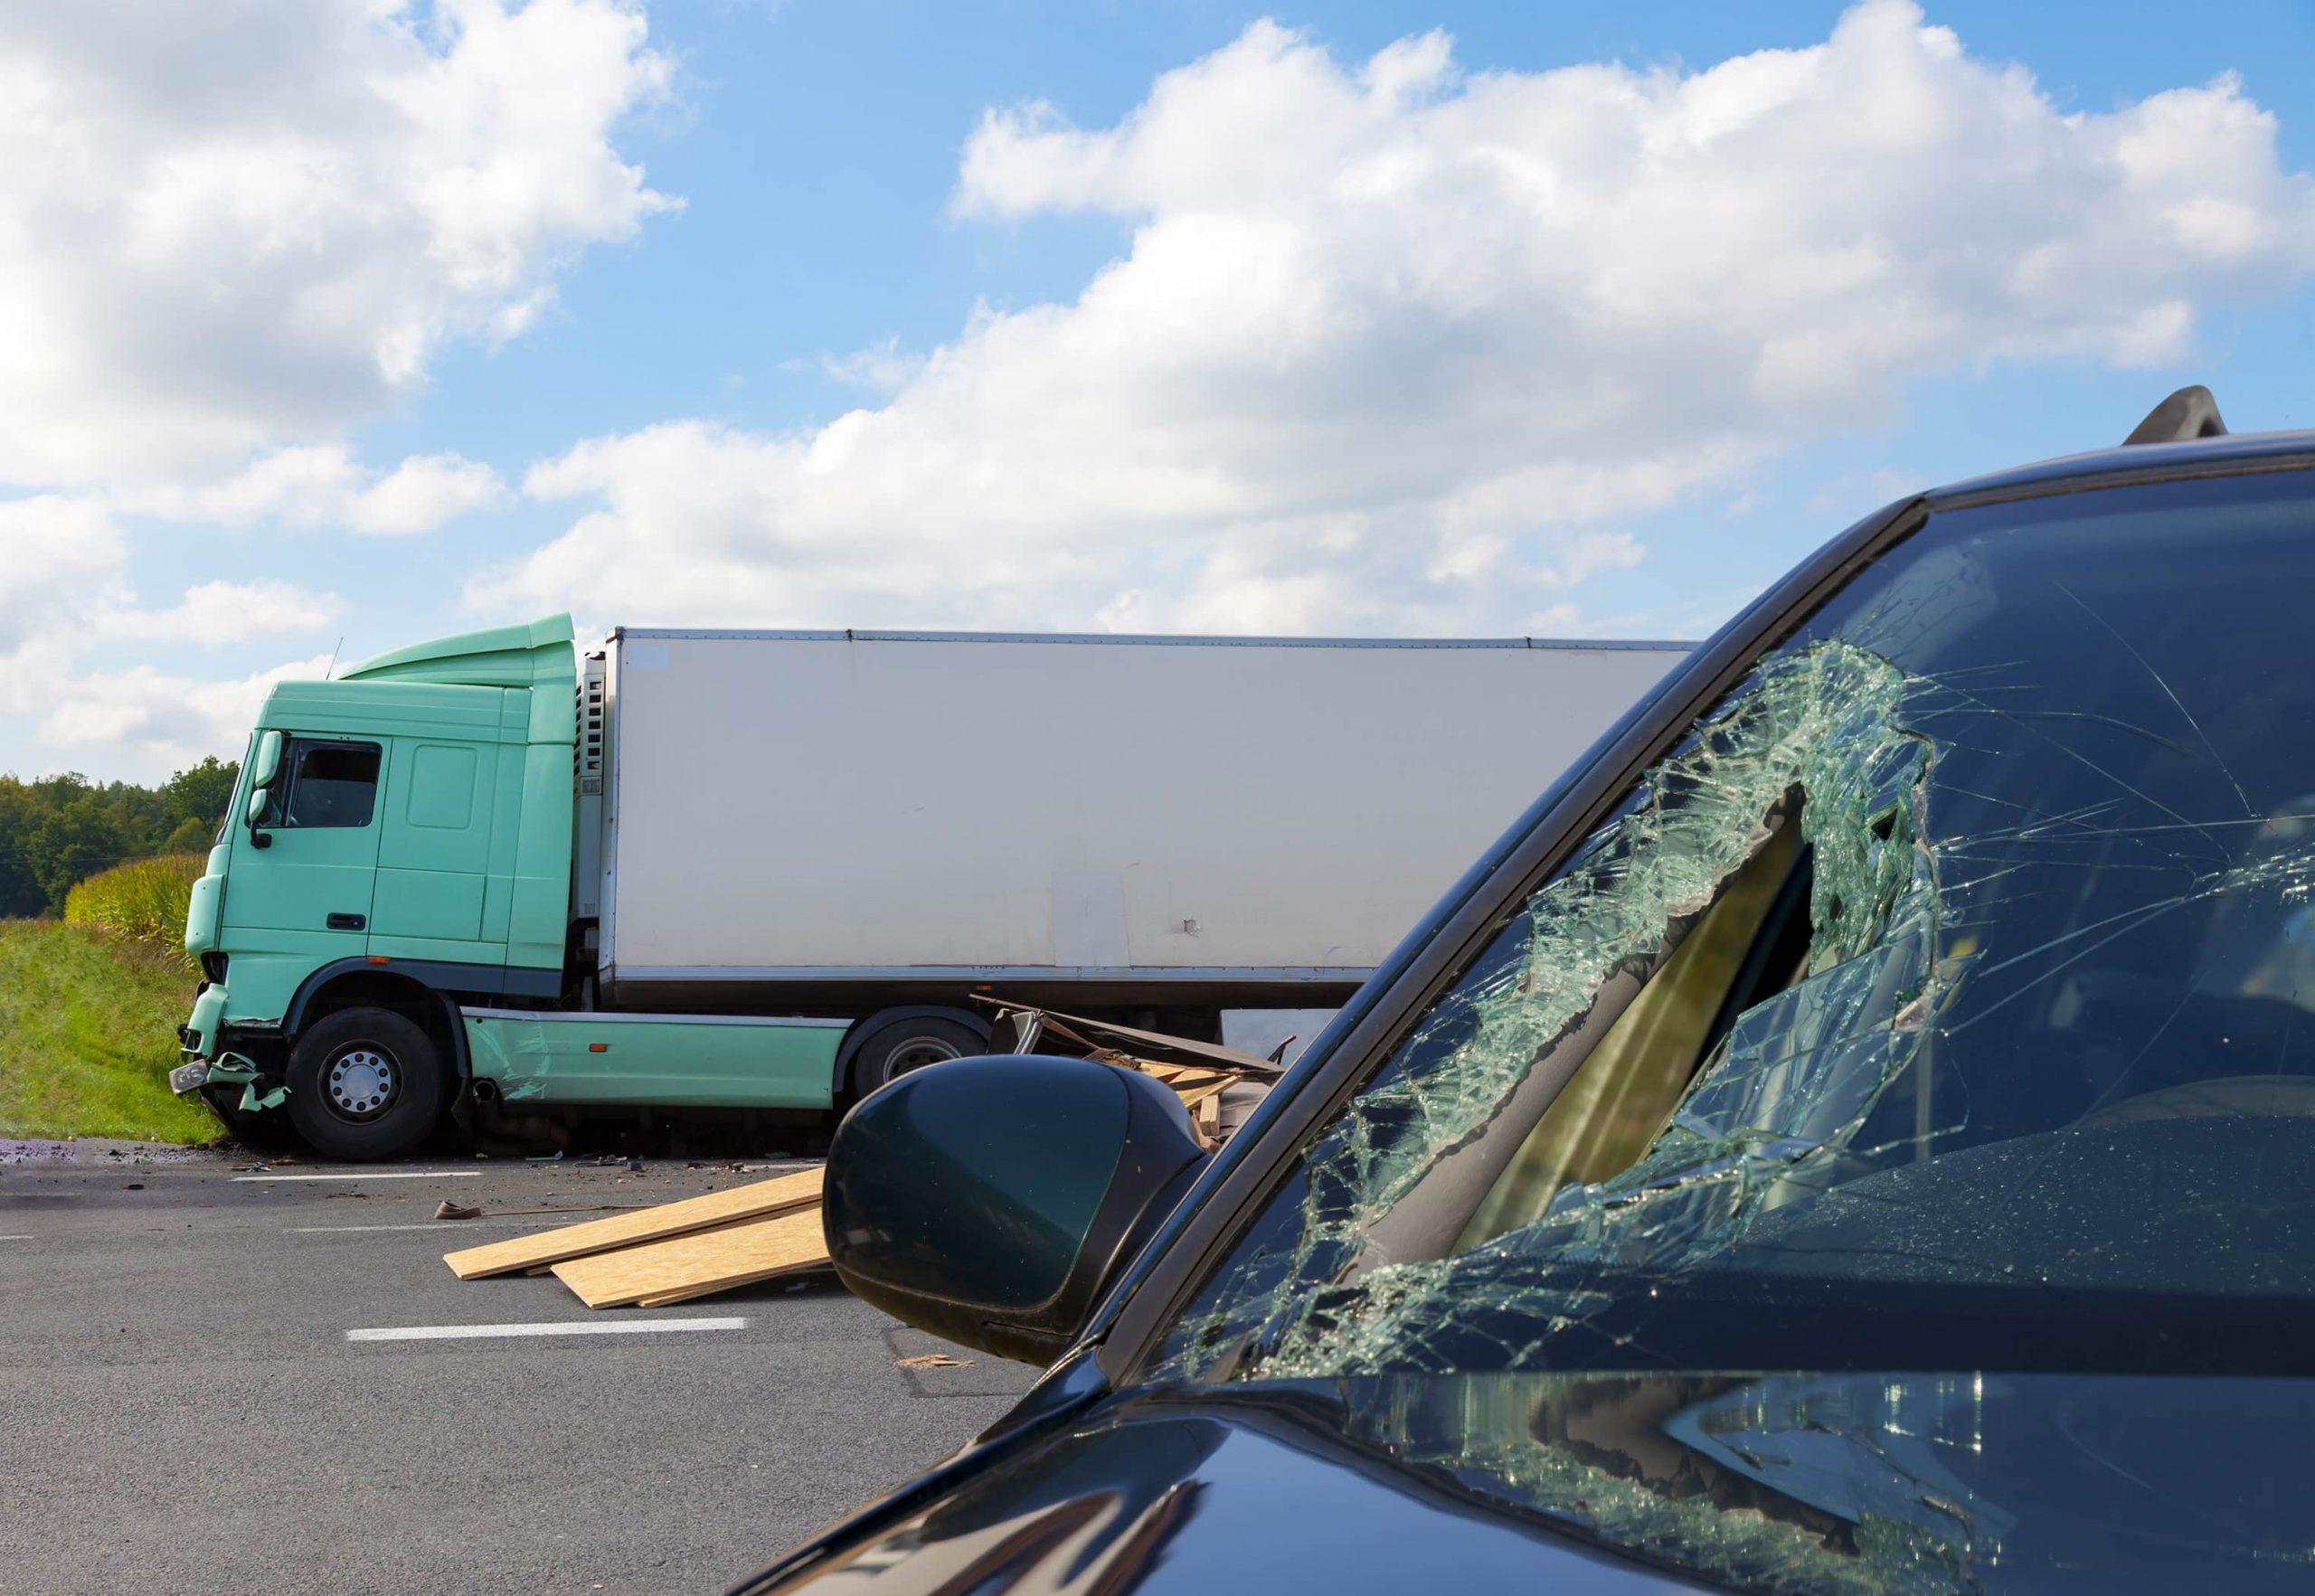 Car Accidents vs Truck Accidents